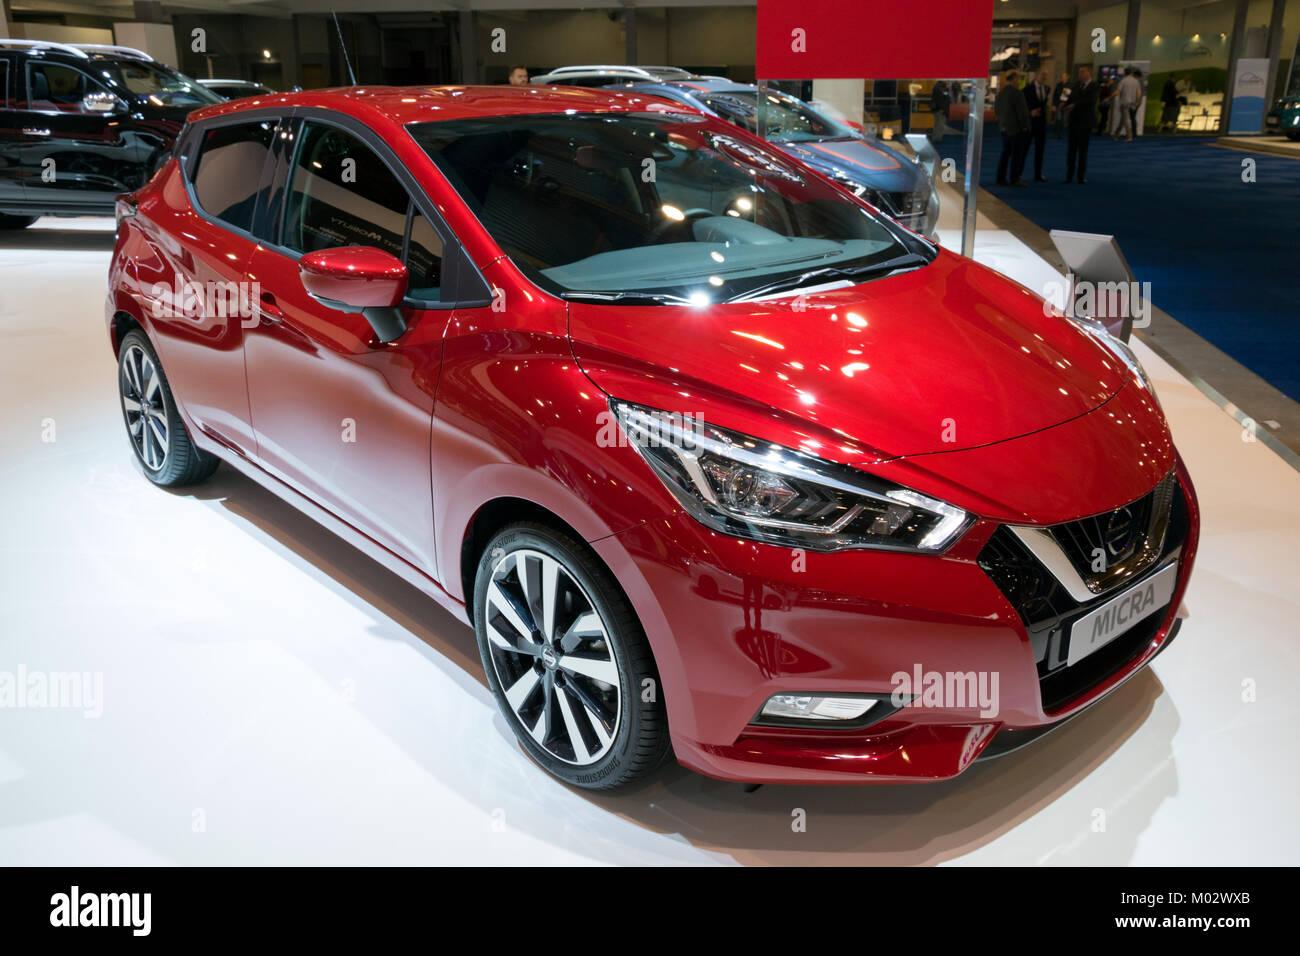 brüssel - jan 10, 2018: nissan micra auto auf dem automobil-salon in